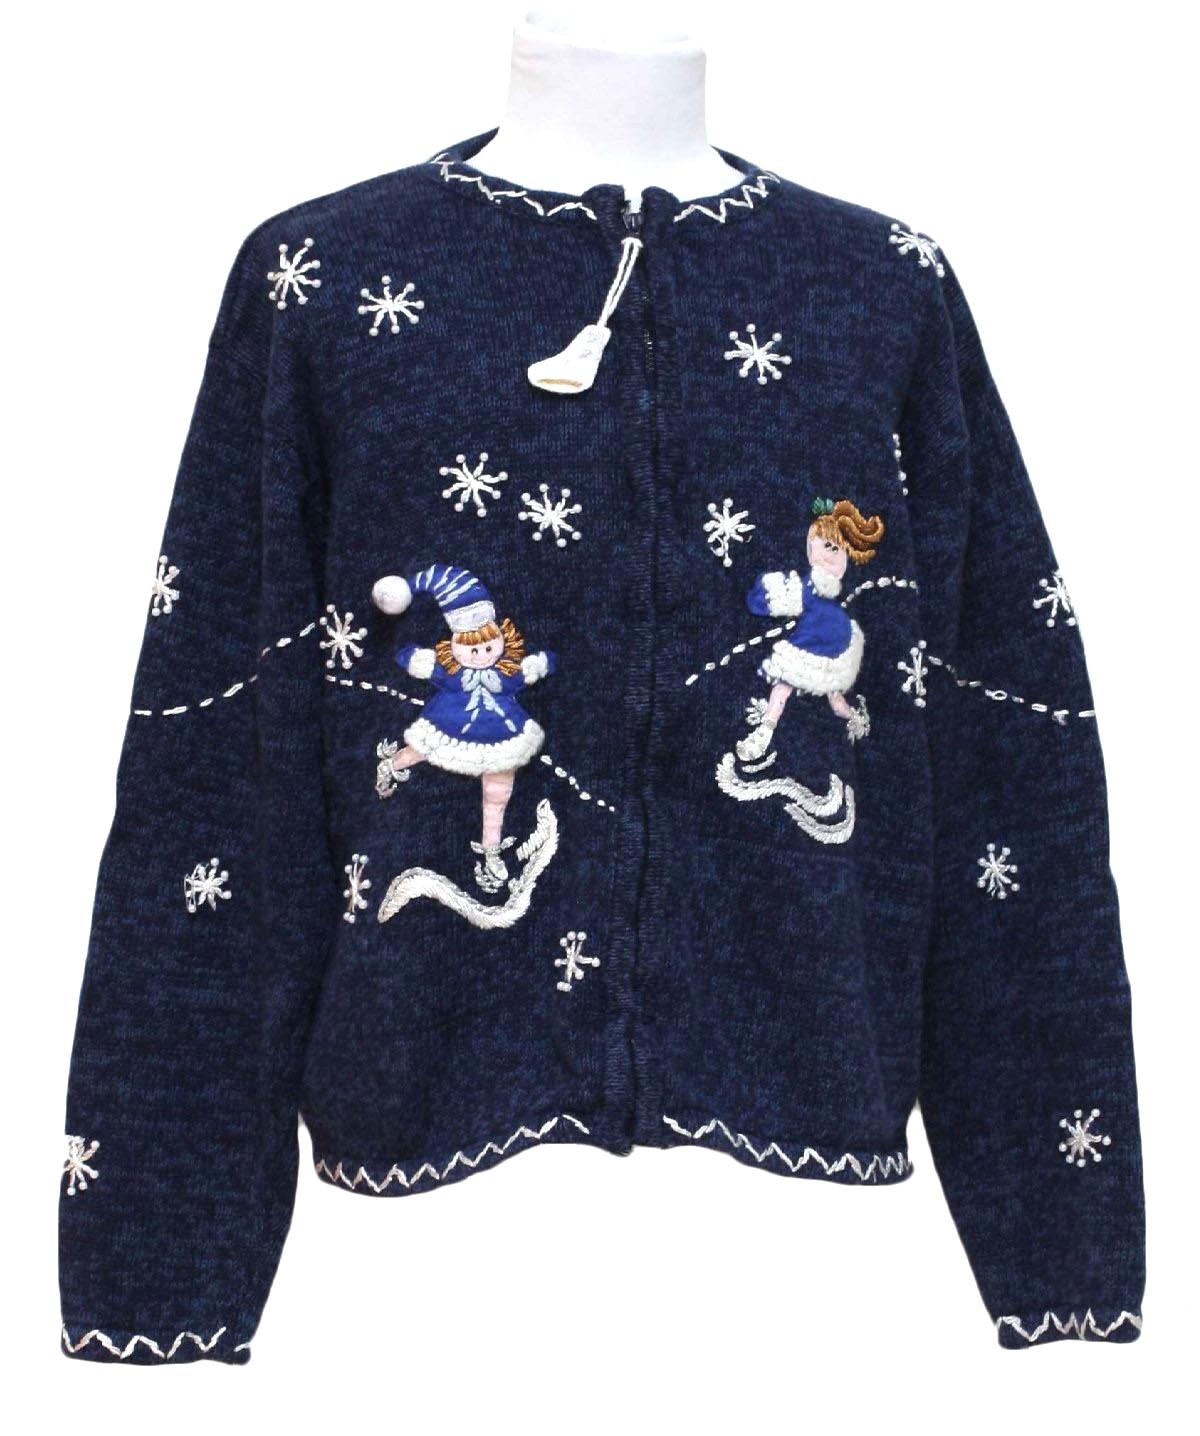 womensgirls ugly christmas sweater tiara girls girls dark navy blue background cotton ramie blend zip front longsleeve ugly christmas sweater - Christmas Jacket